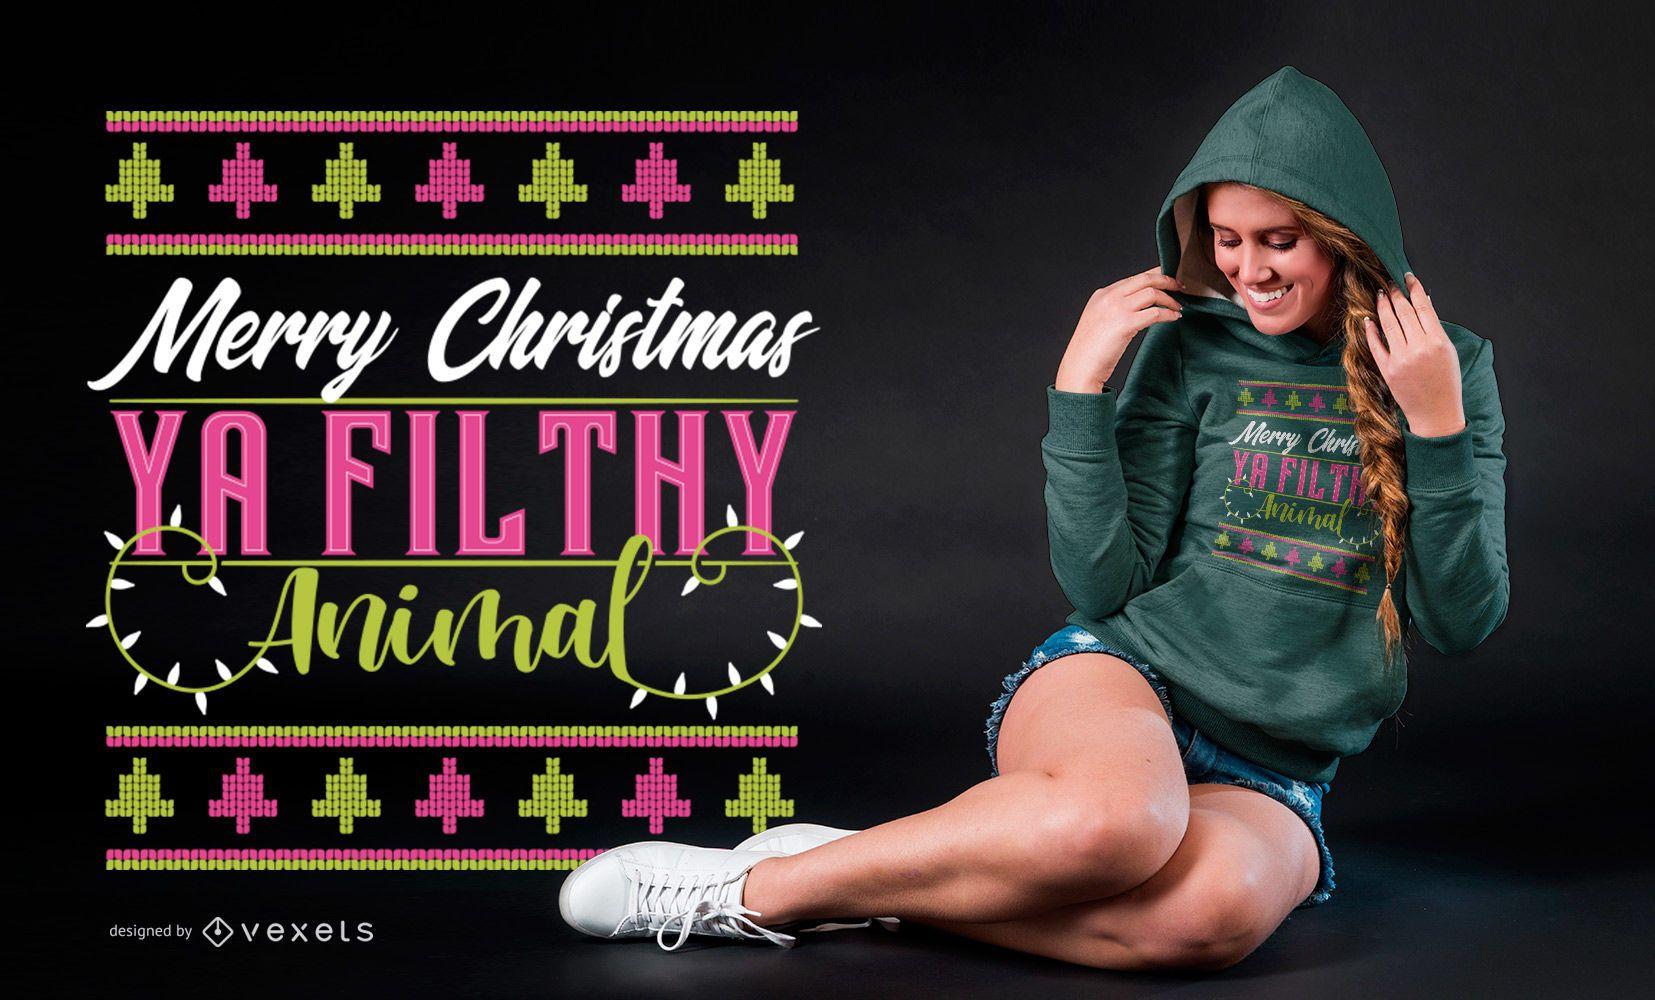 Feliz Navidad Ya Filthy Animal Dise?o de camiseta